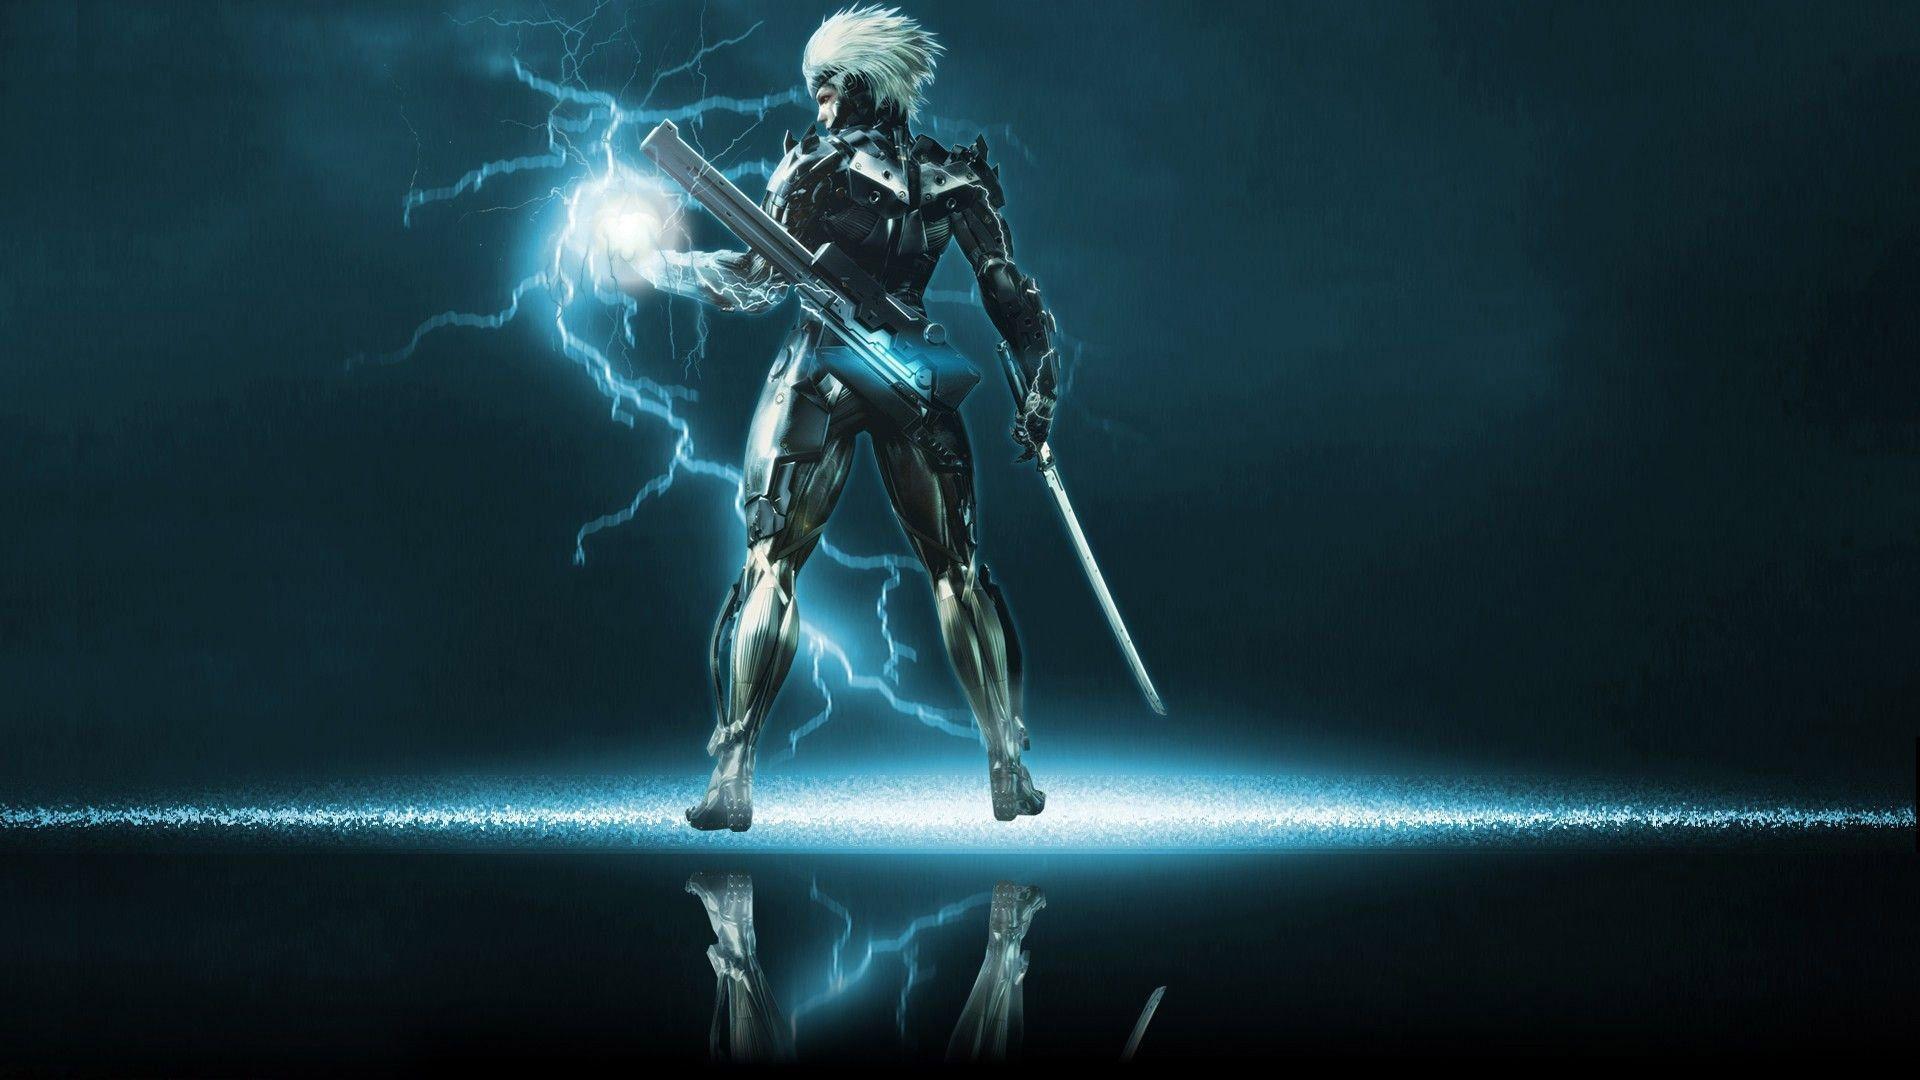 Metal Gear Solid V   game hd wallpaper   Pinterest   Metal gear solid, Metal  gear and Hd wallpaper